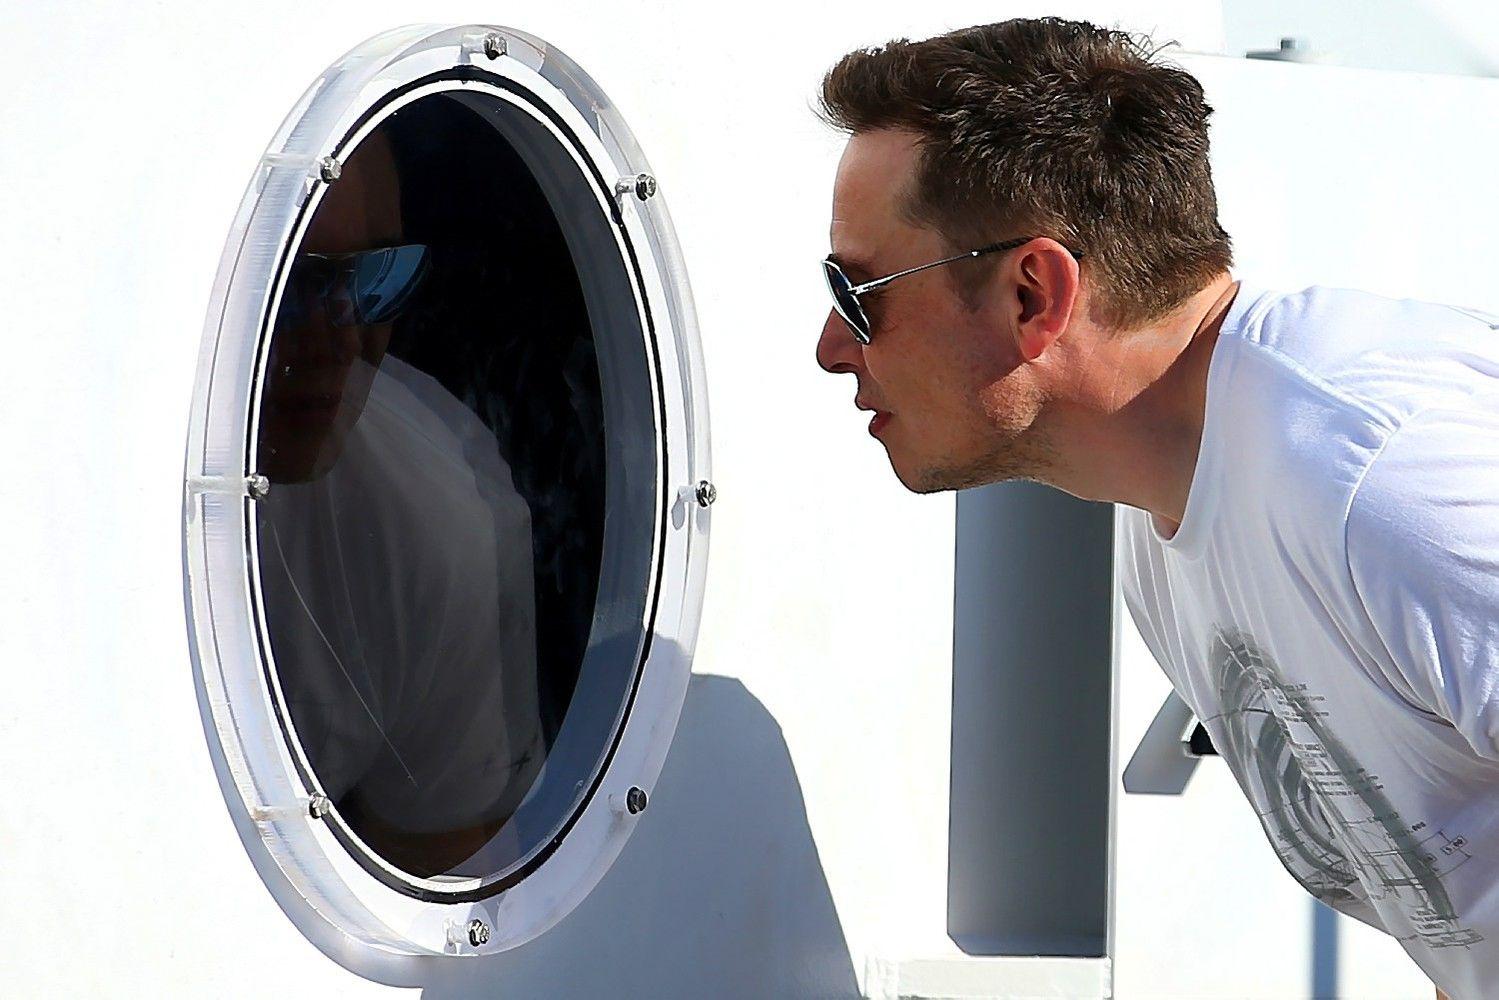 Keli Elono Musko perversmai